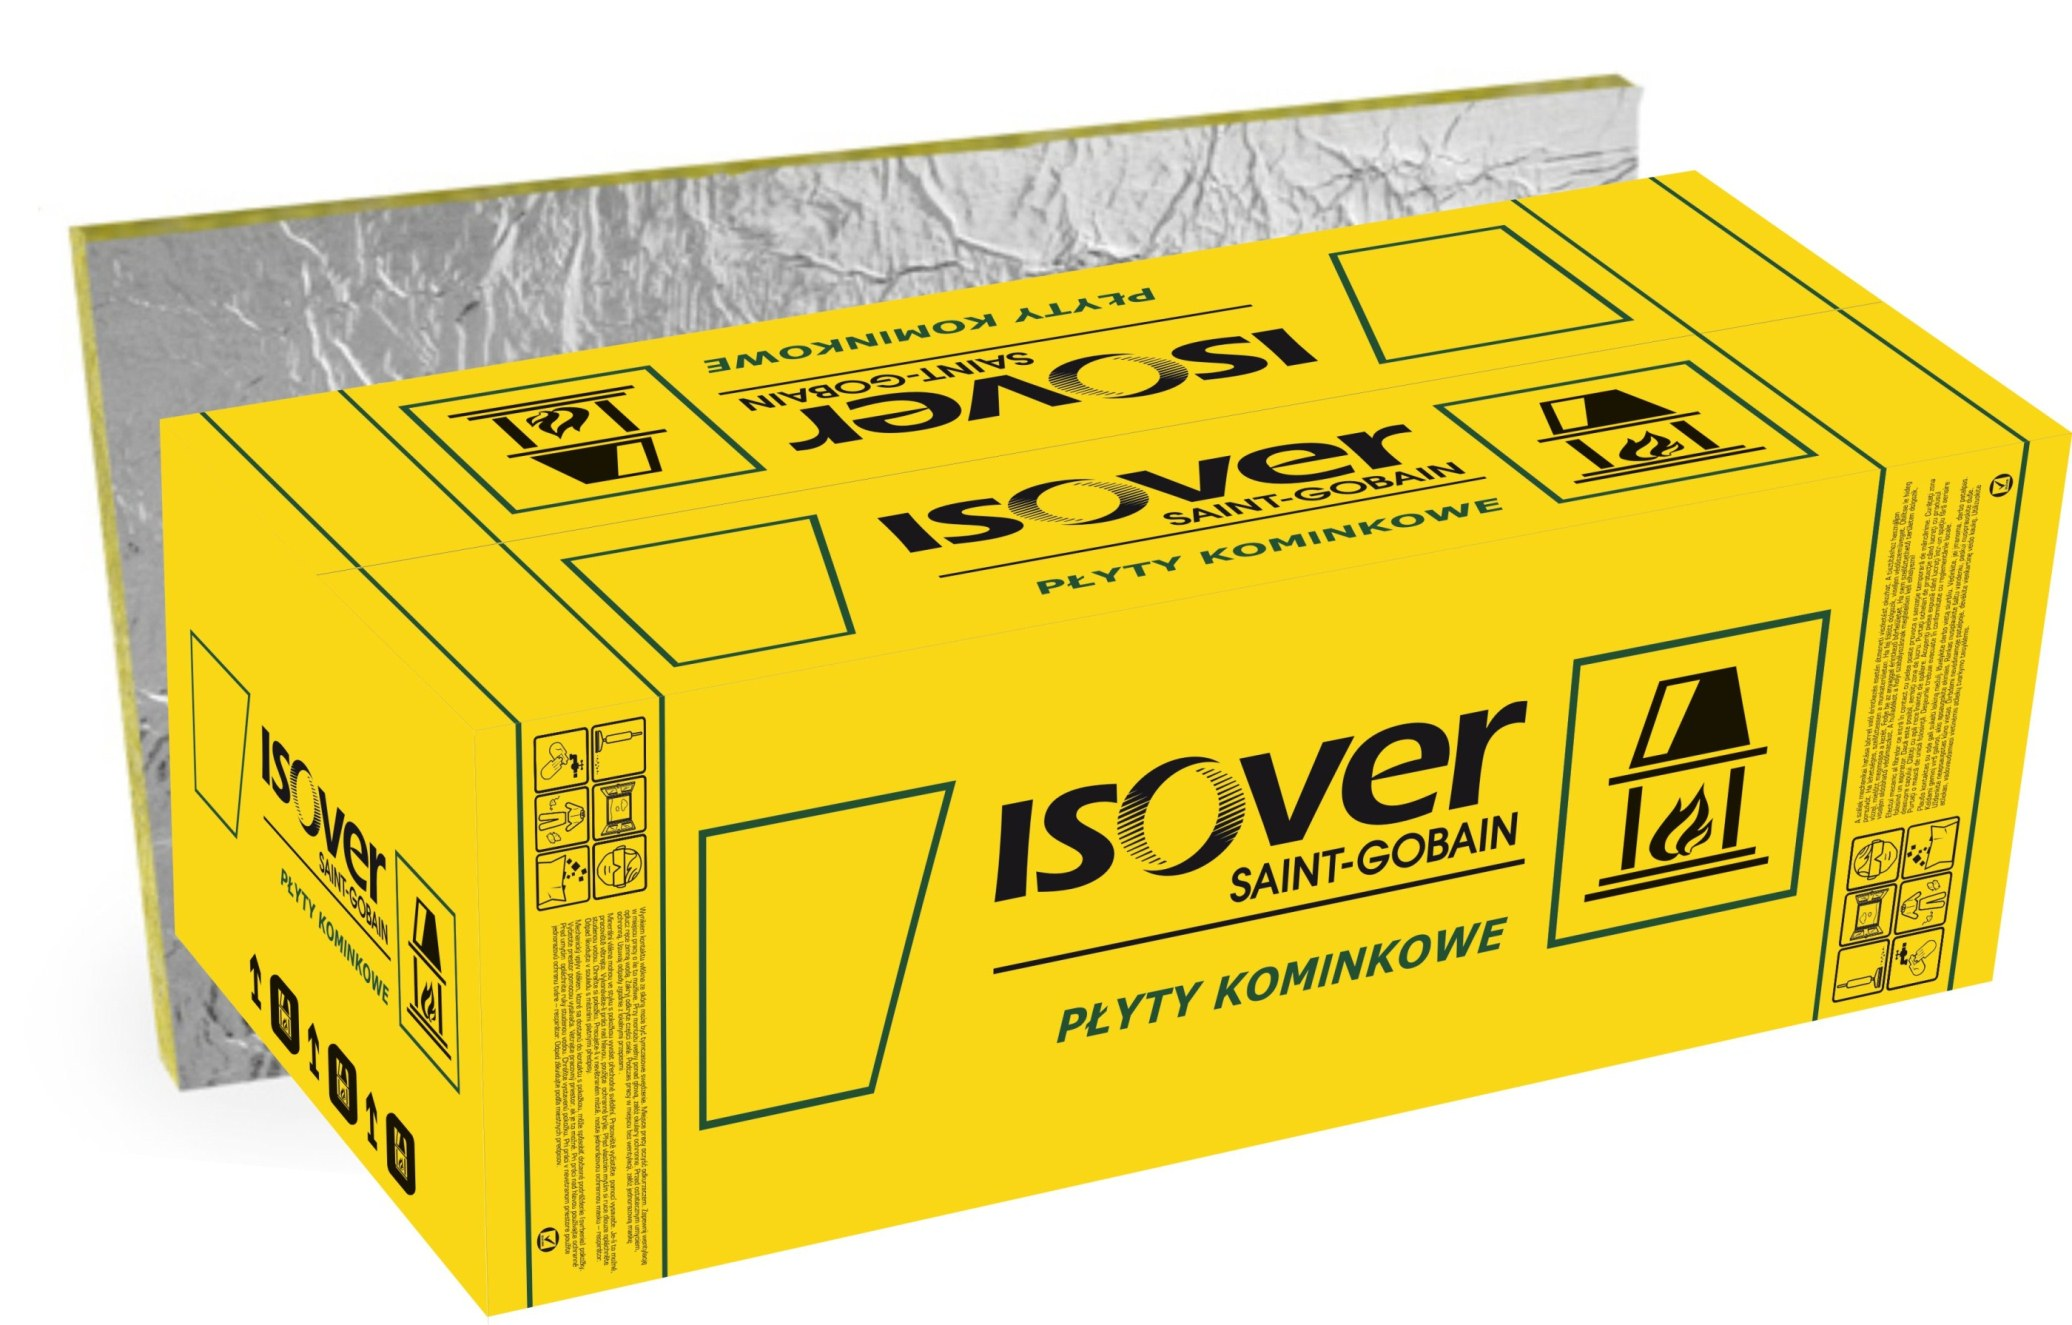 isover_plyty_kominkowe